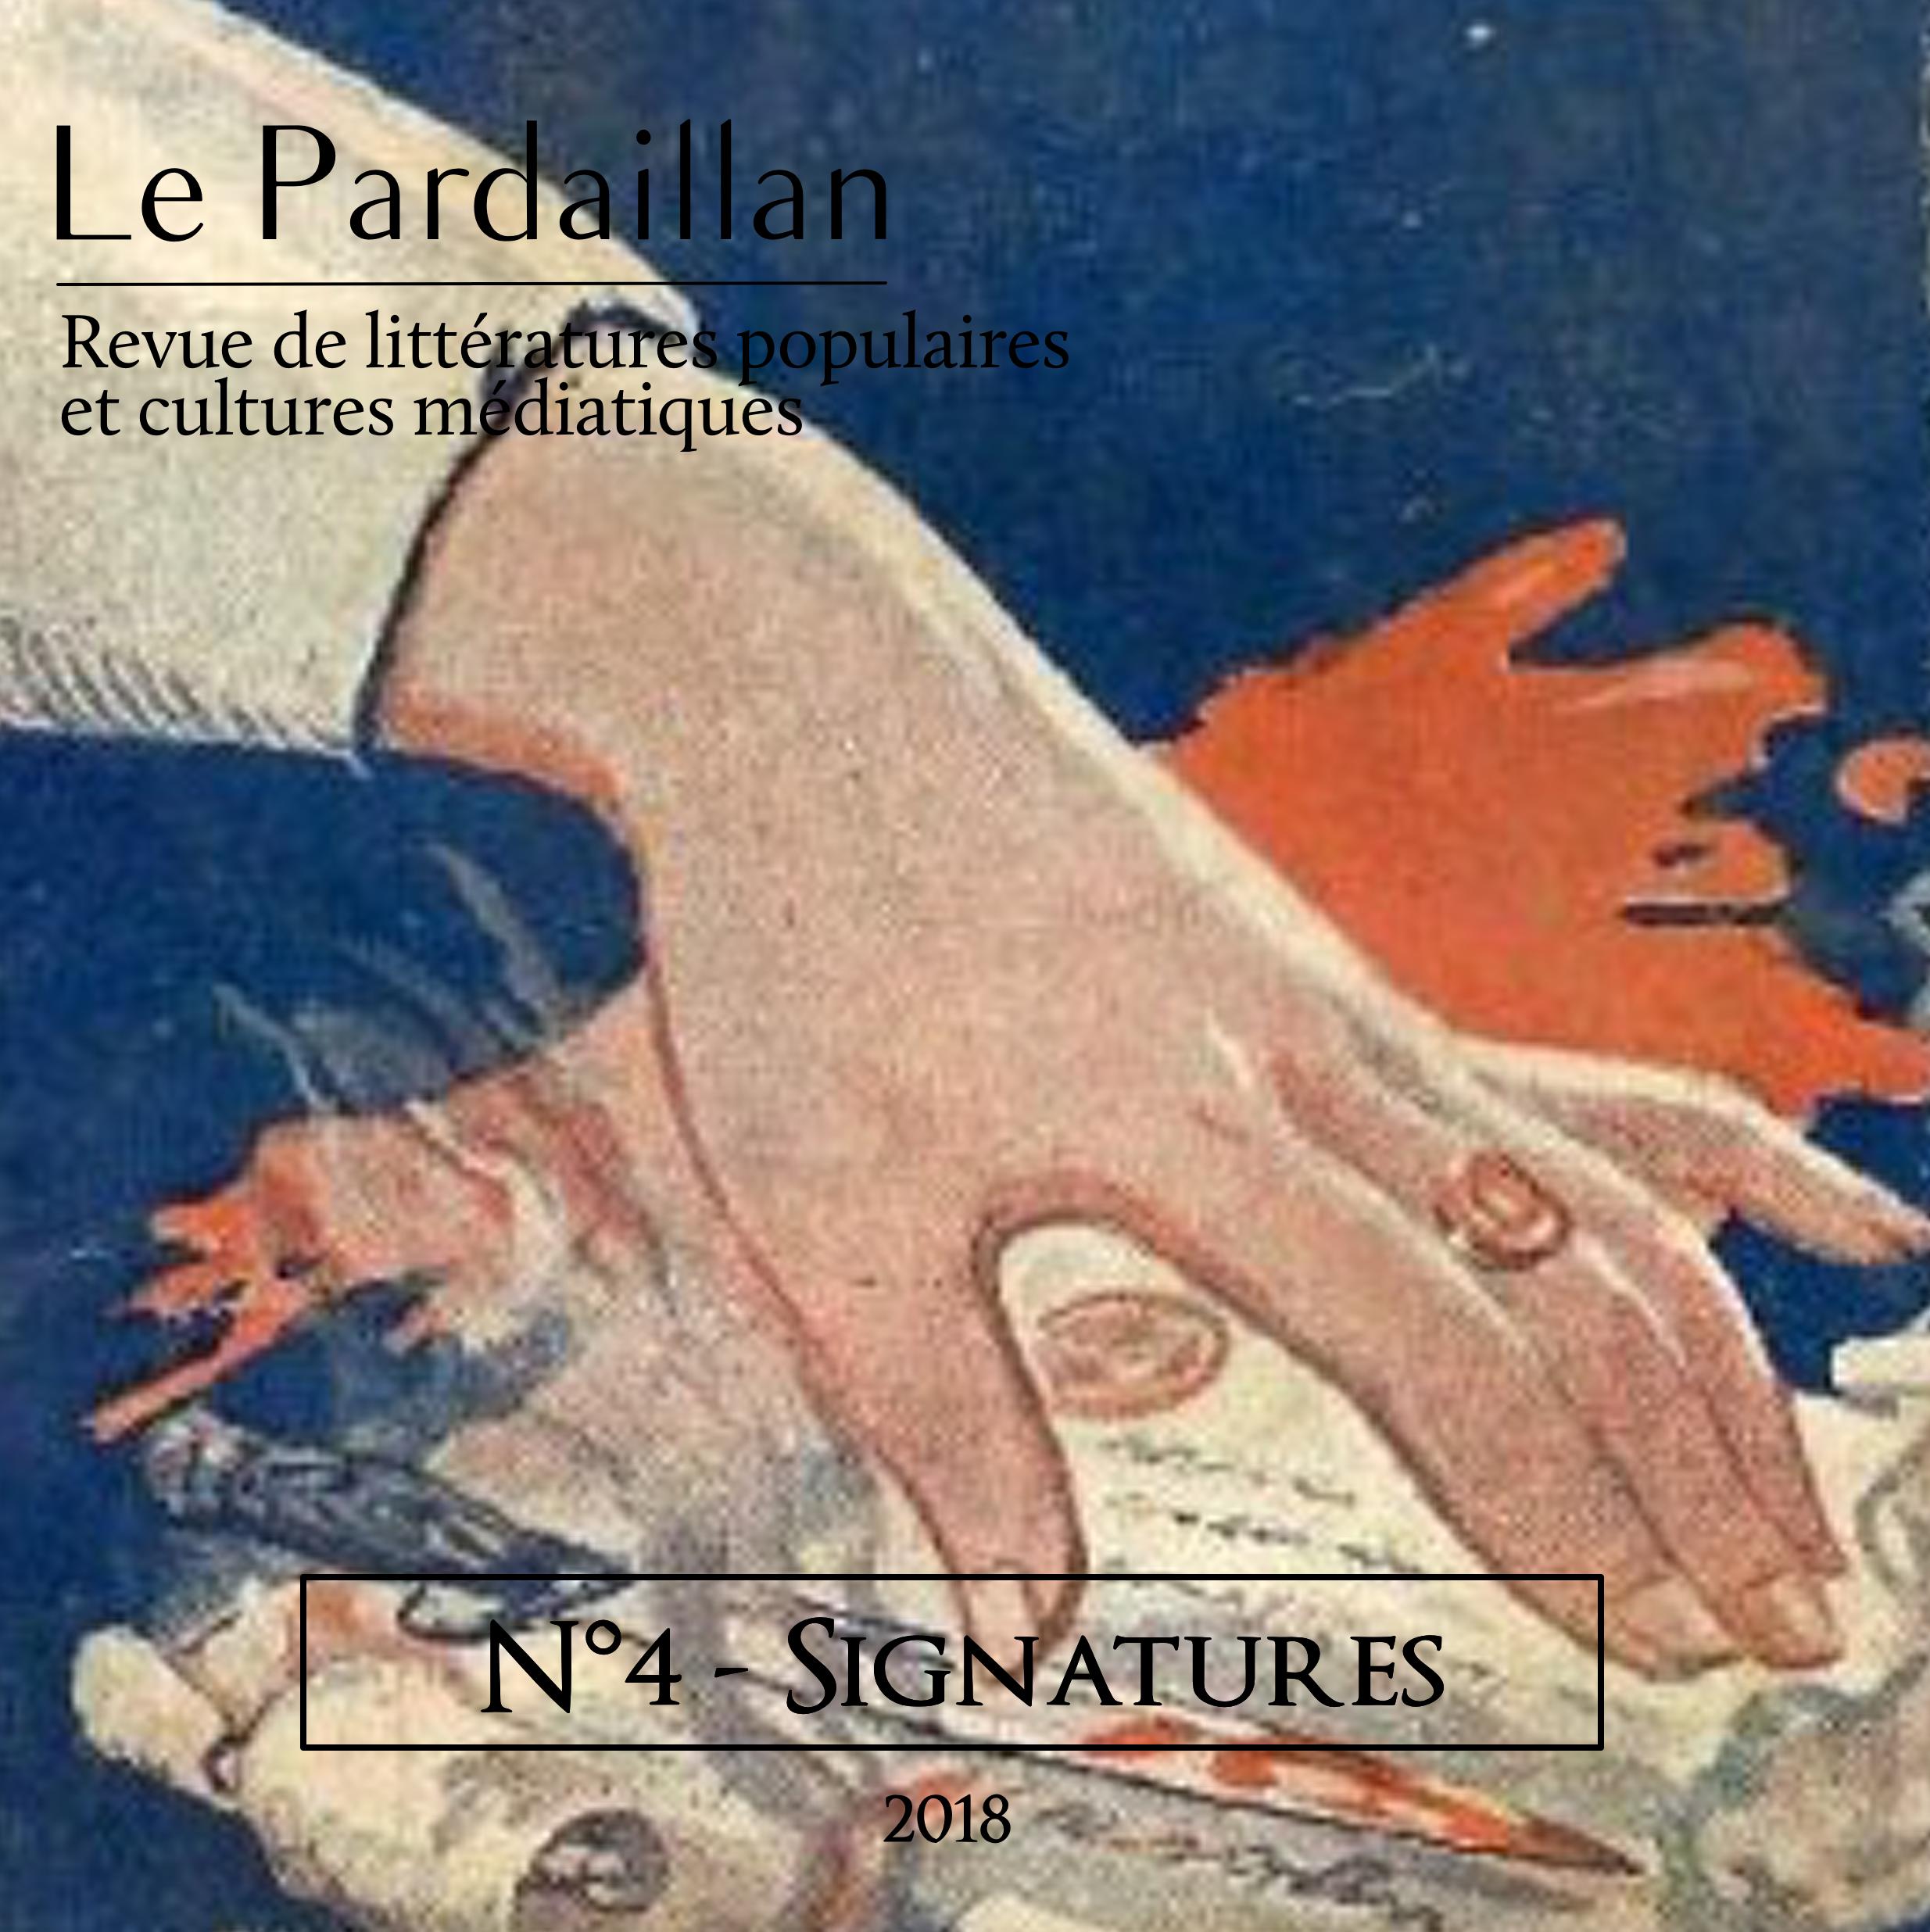 Le Pardaillan N°4 - Signatures Image